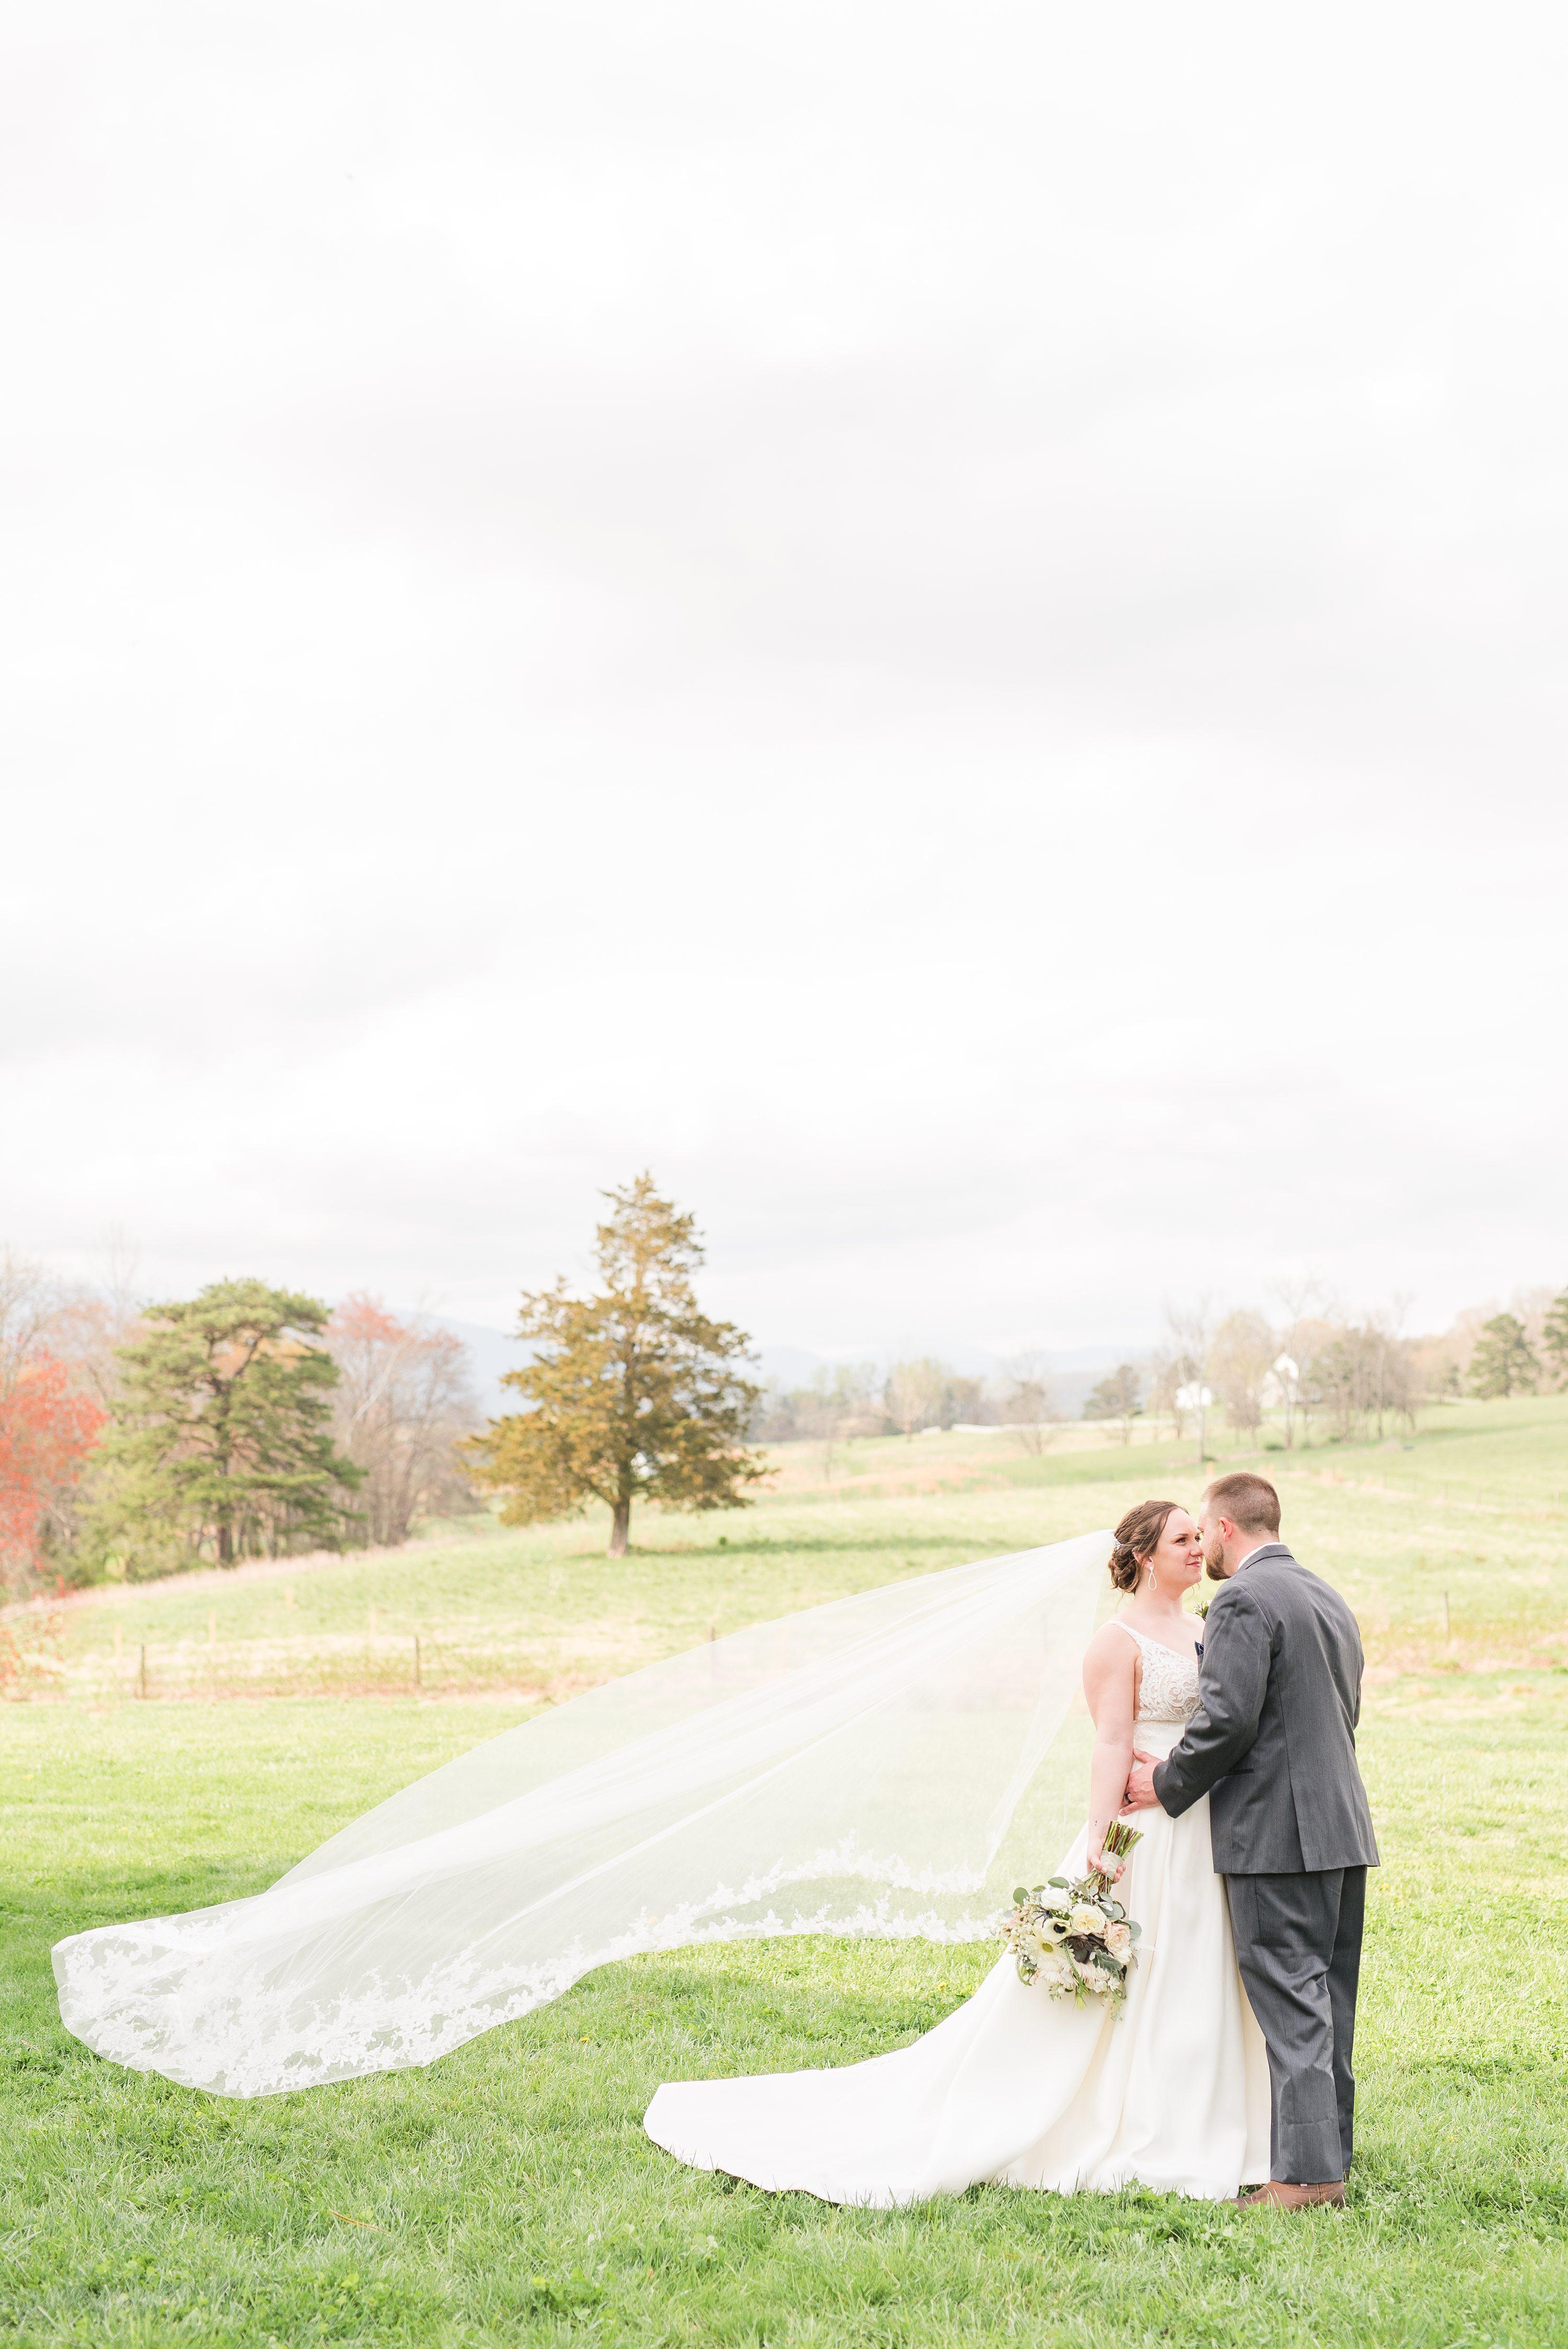 Outdoor Spring Wedding,Blue Ridge,bride and groom,mountain wedding,edgewood barn